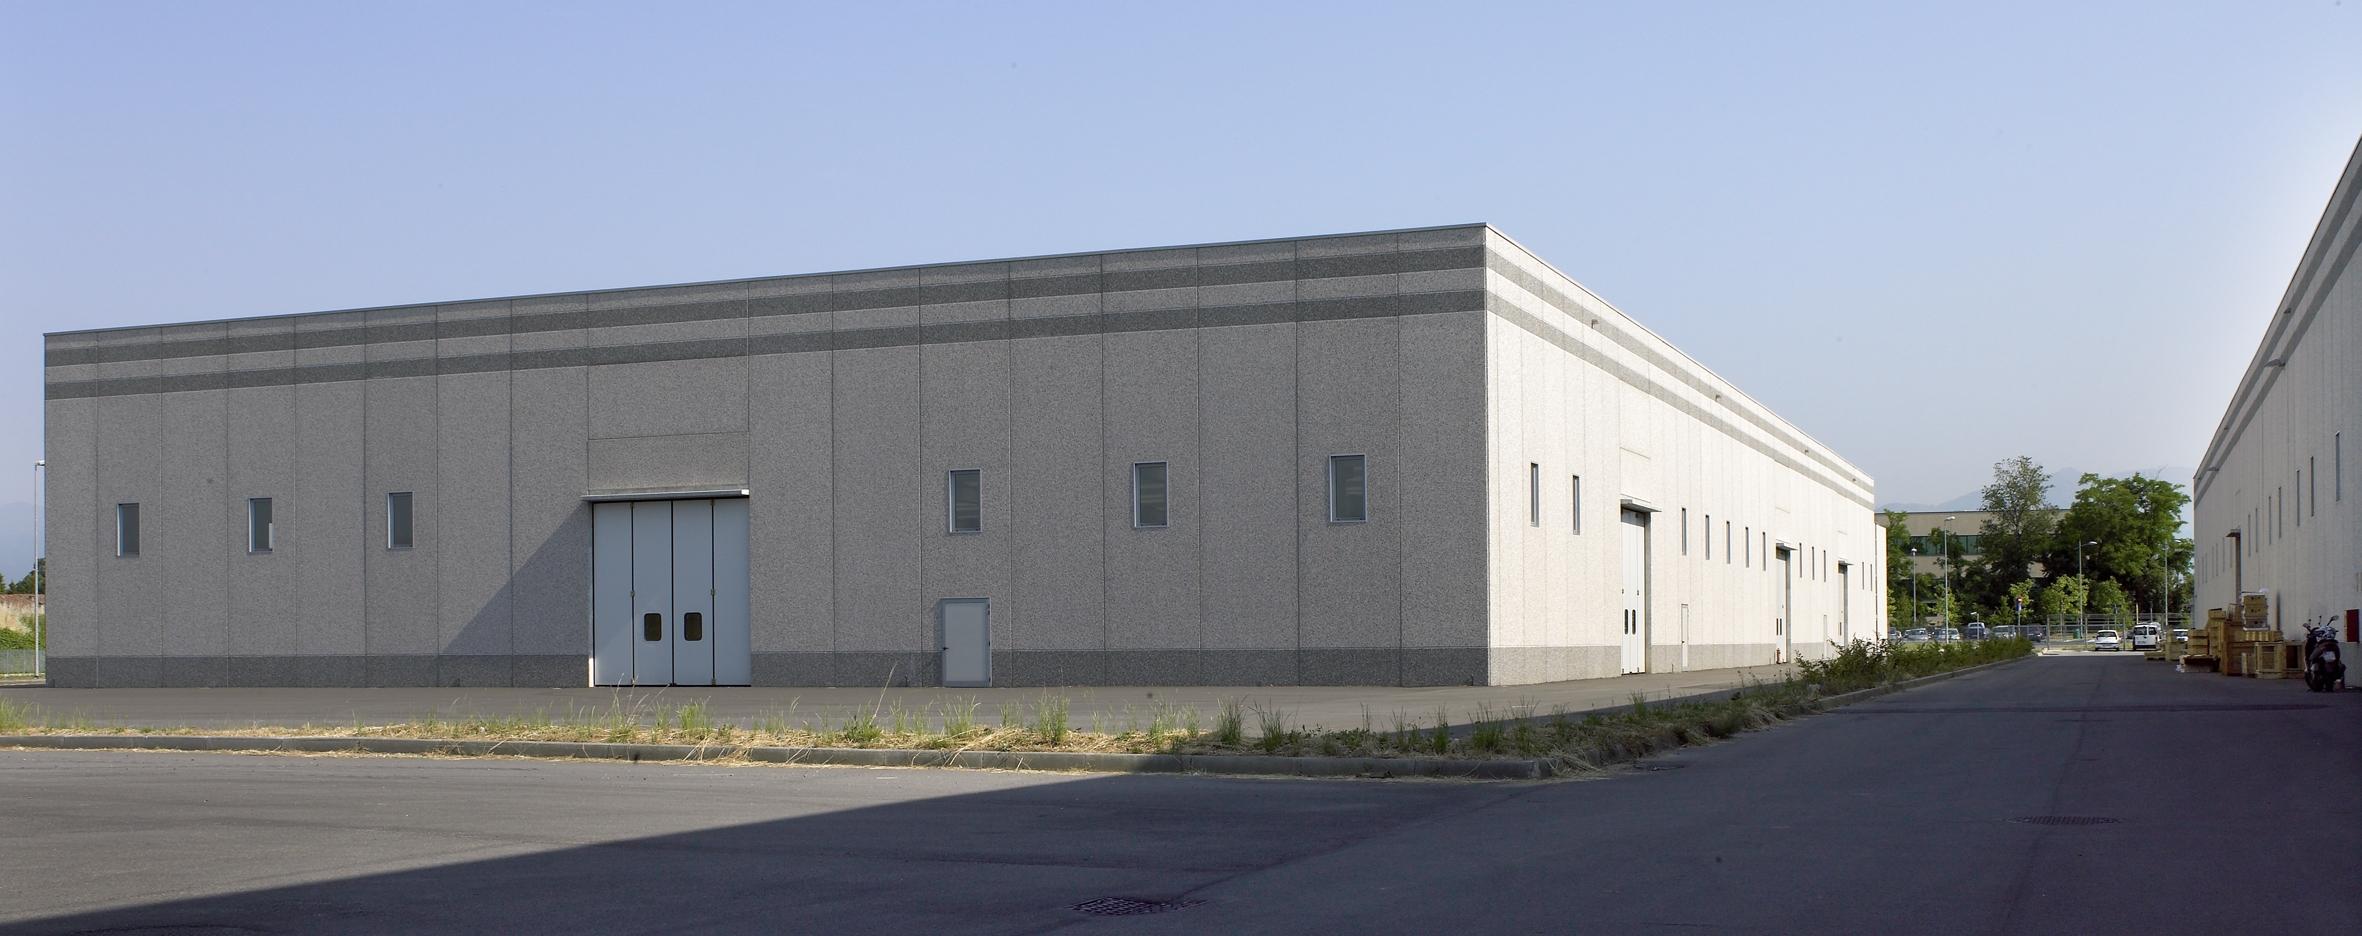 Hale industriale cu elemente structurale prefabricate din beton armat MAGNETTI - Poza 6